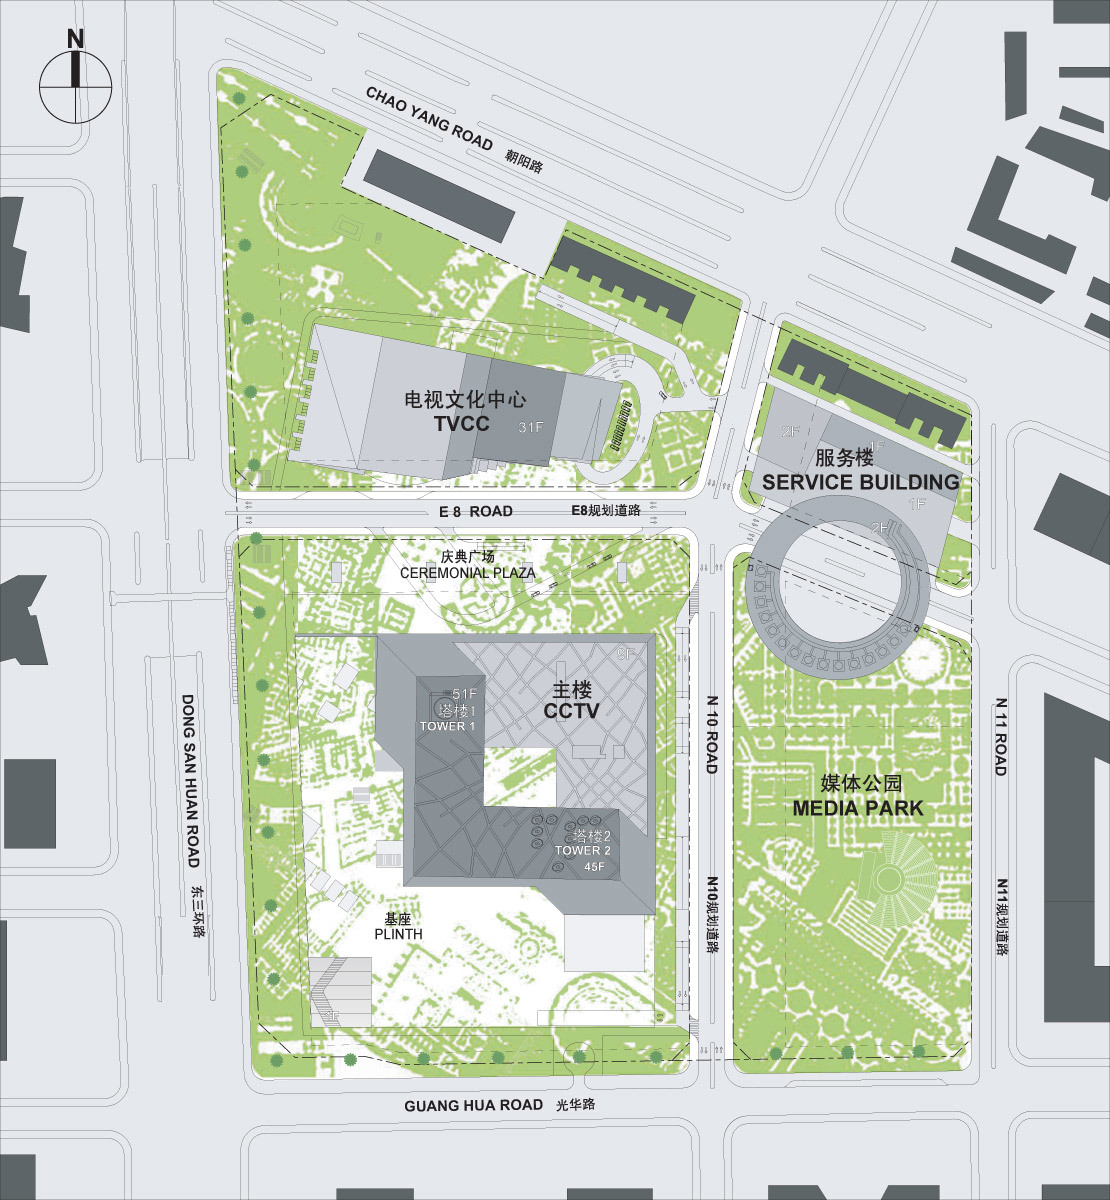 CCTV/OMA - Landscape Plan, Image courtesy of OMA